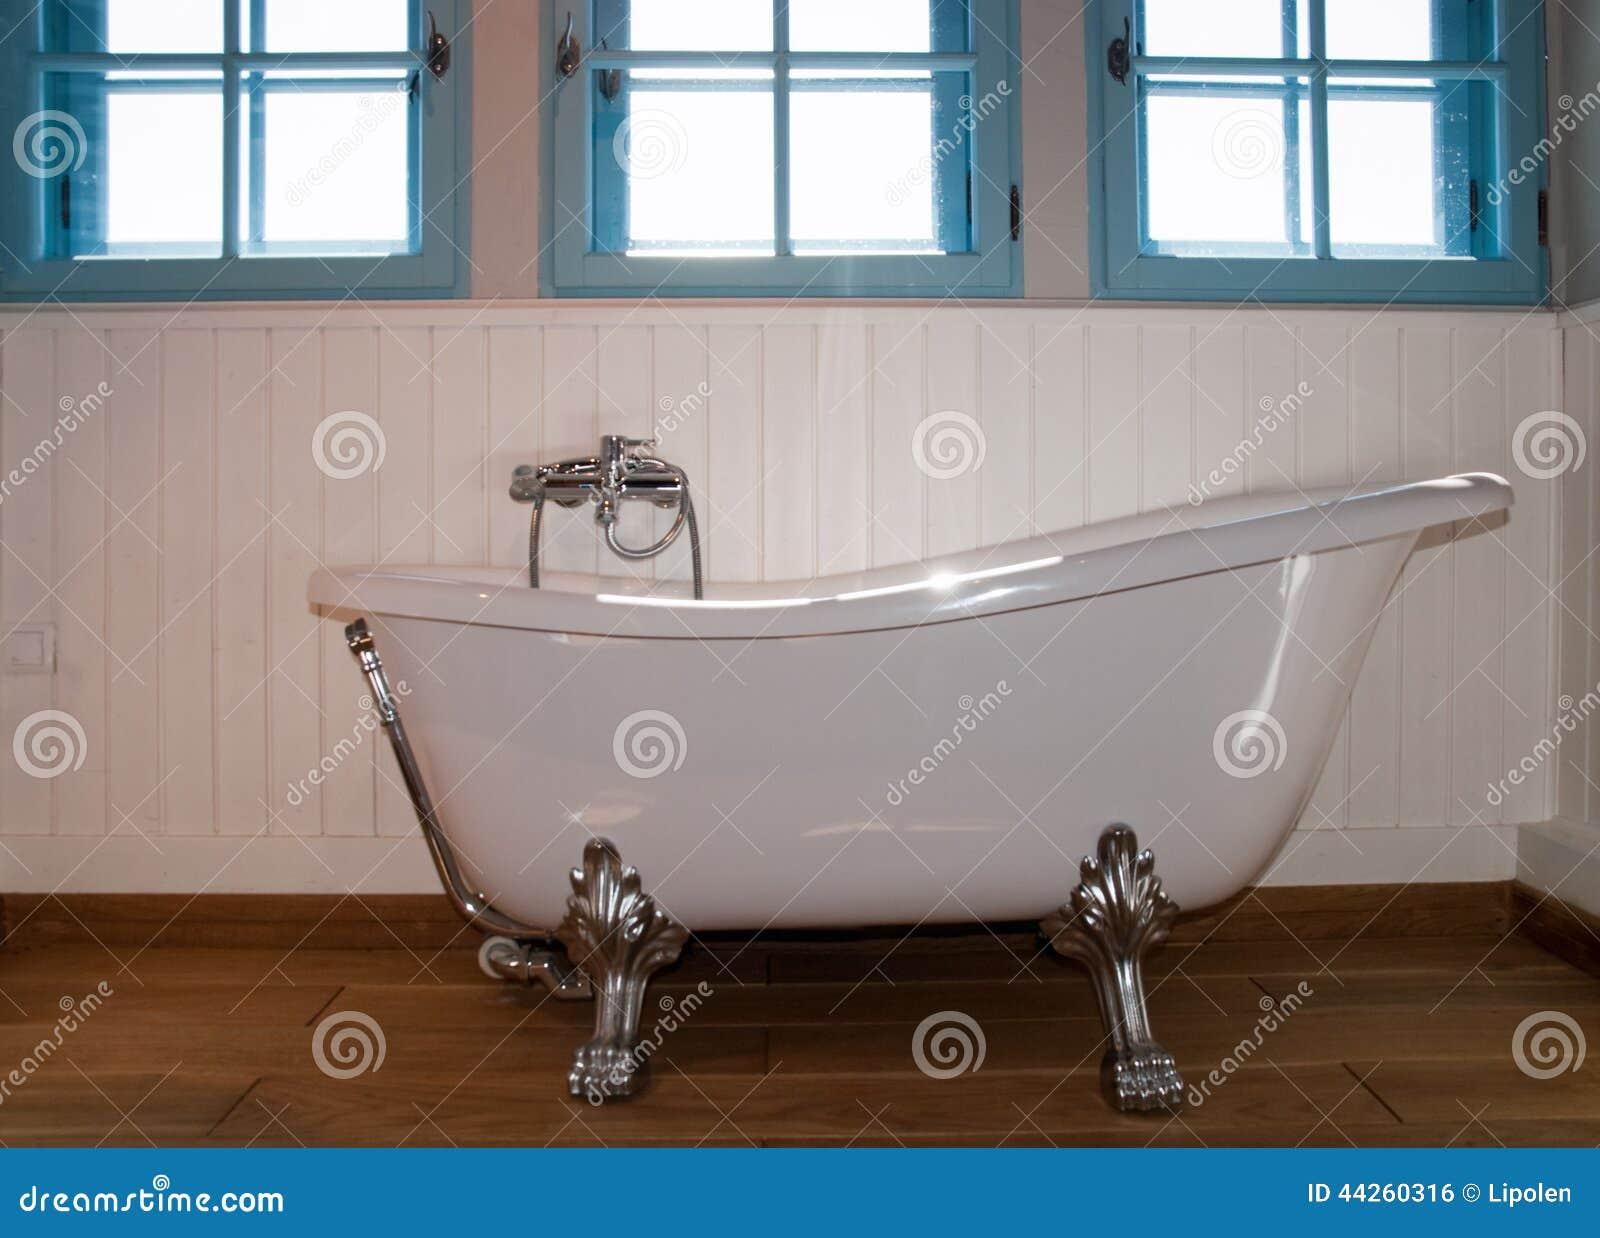 Retro Bath Stock Photo Image Of Blue Paneling Room 44260316